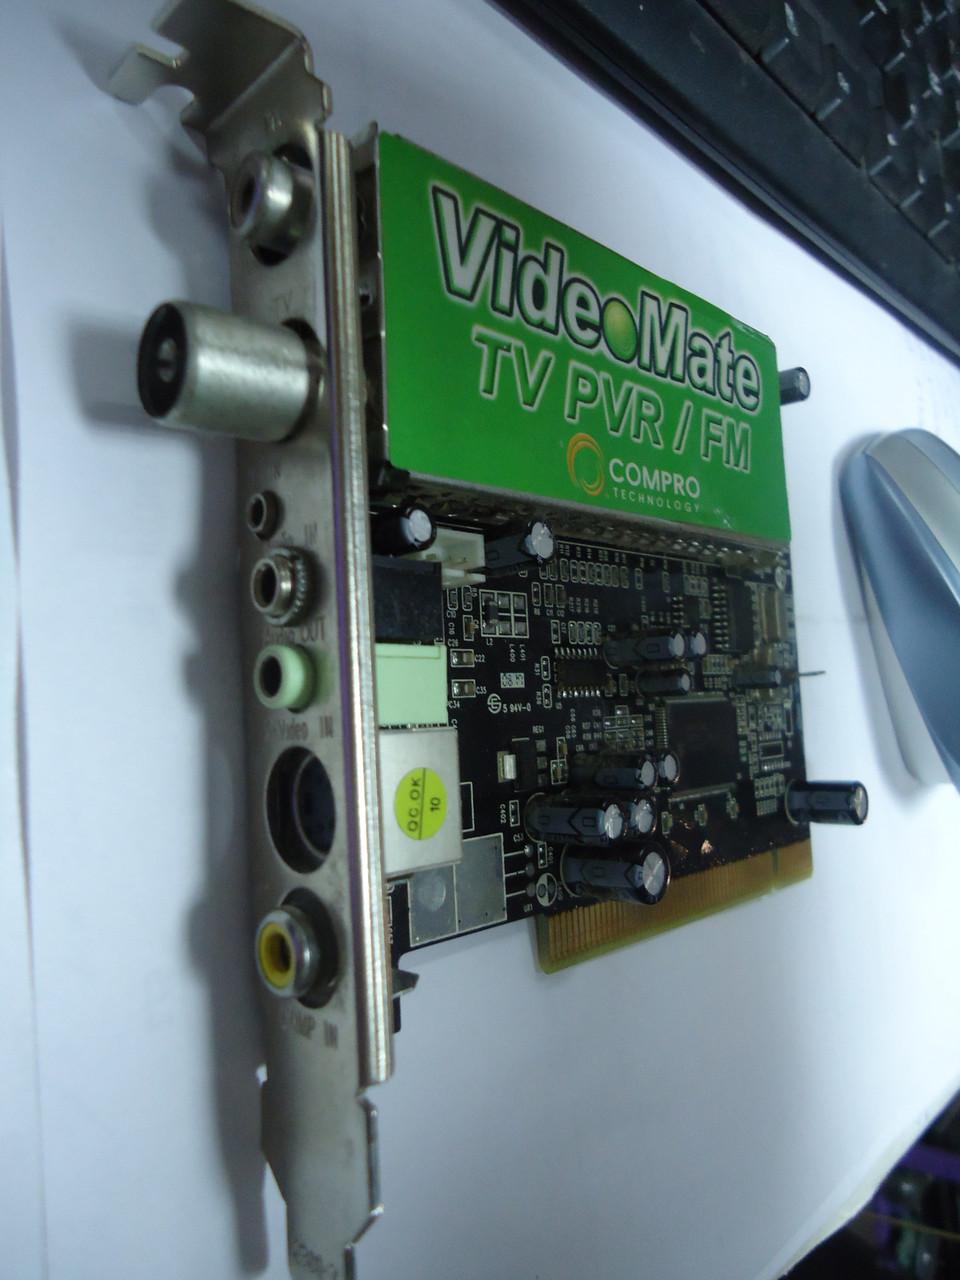 ТВ-тюнер Compro VideoMate TV/FM